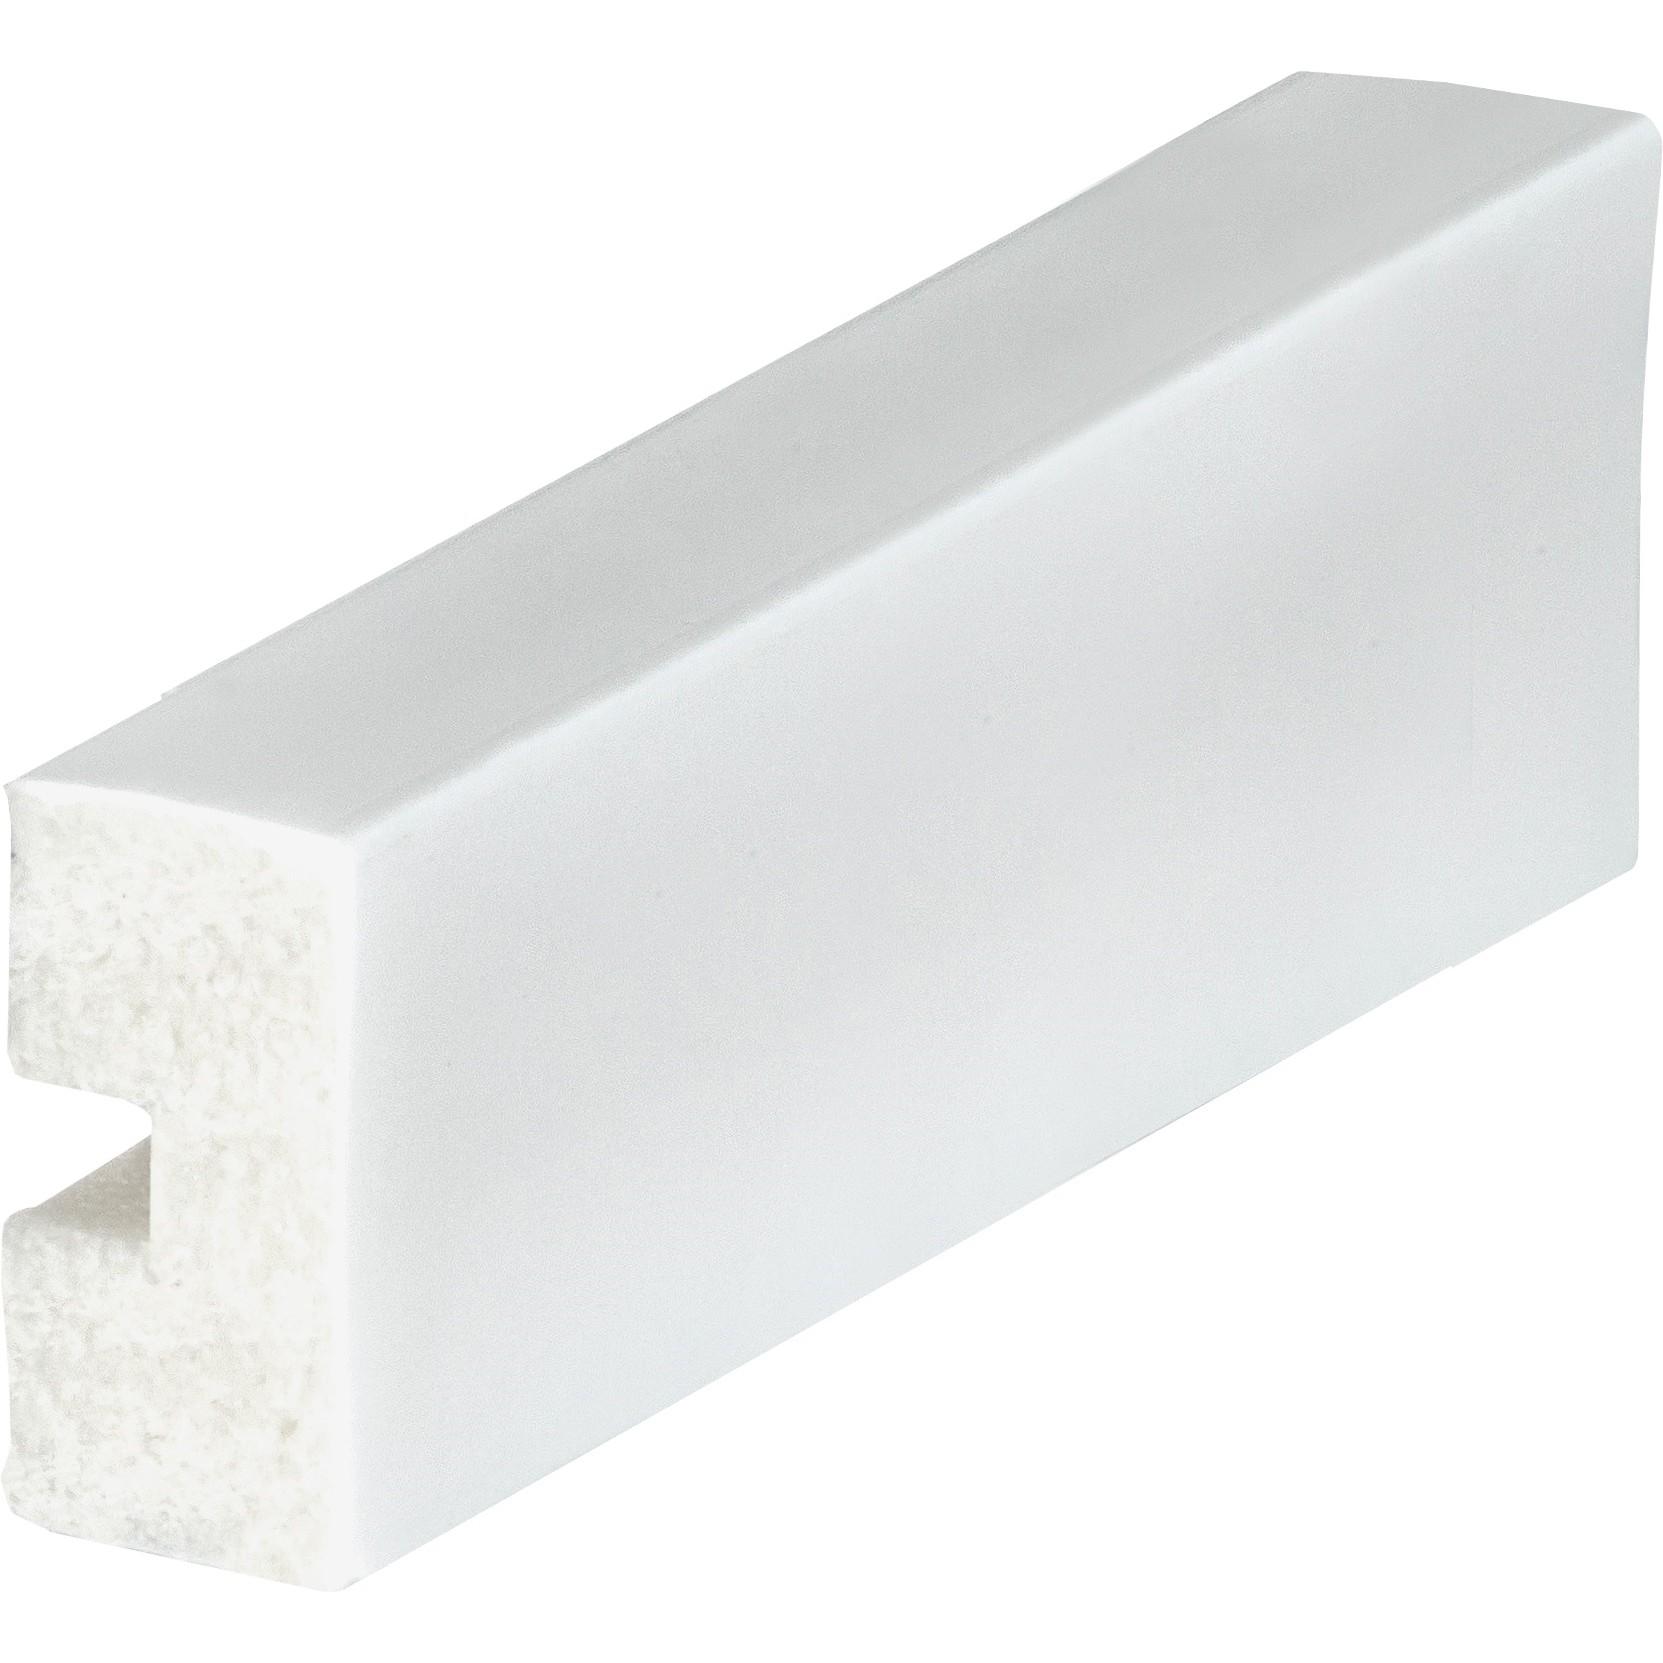 Alizar Rodameio Poliestireno Branco 3x240cm - Arquitech